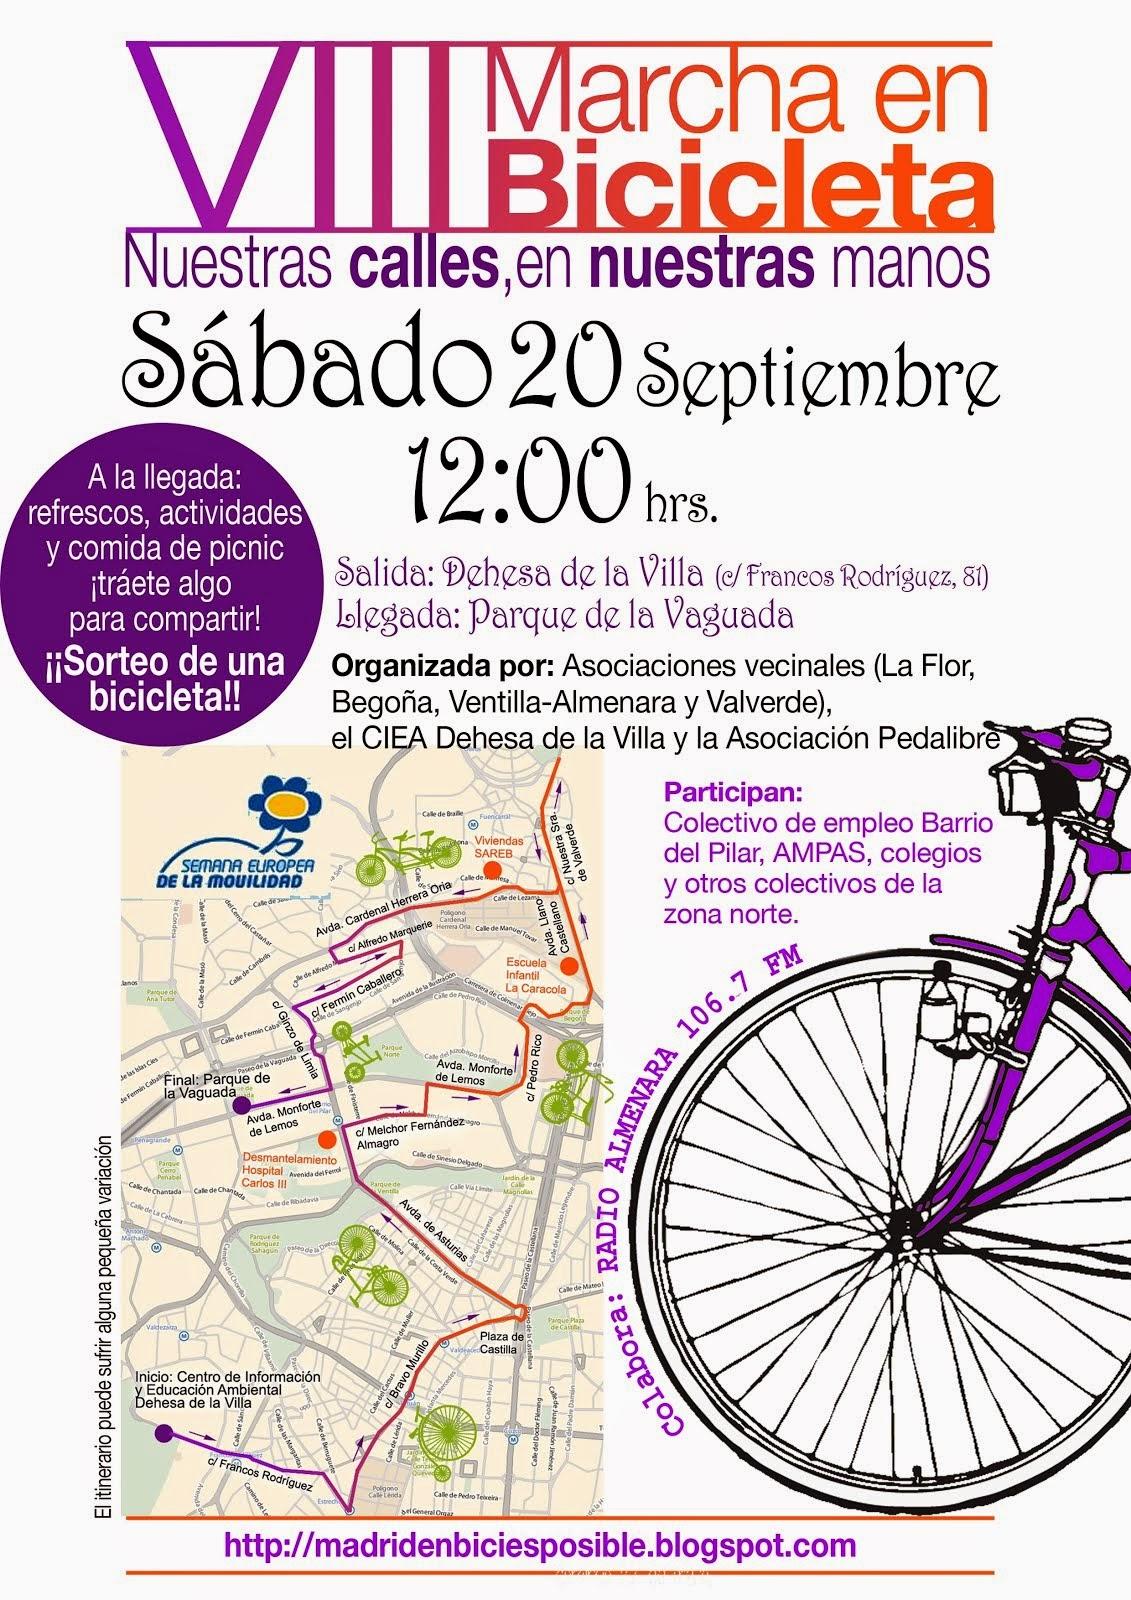 Marcha Ciclista Reivindicativa